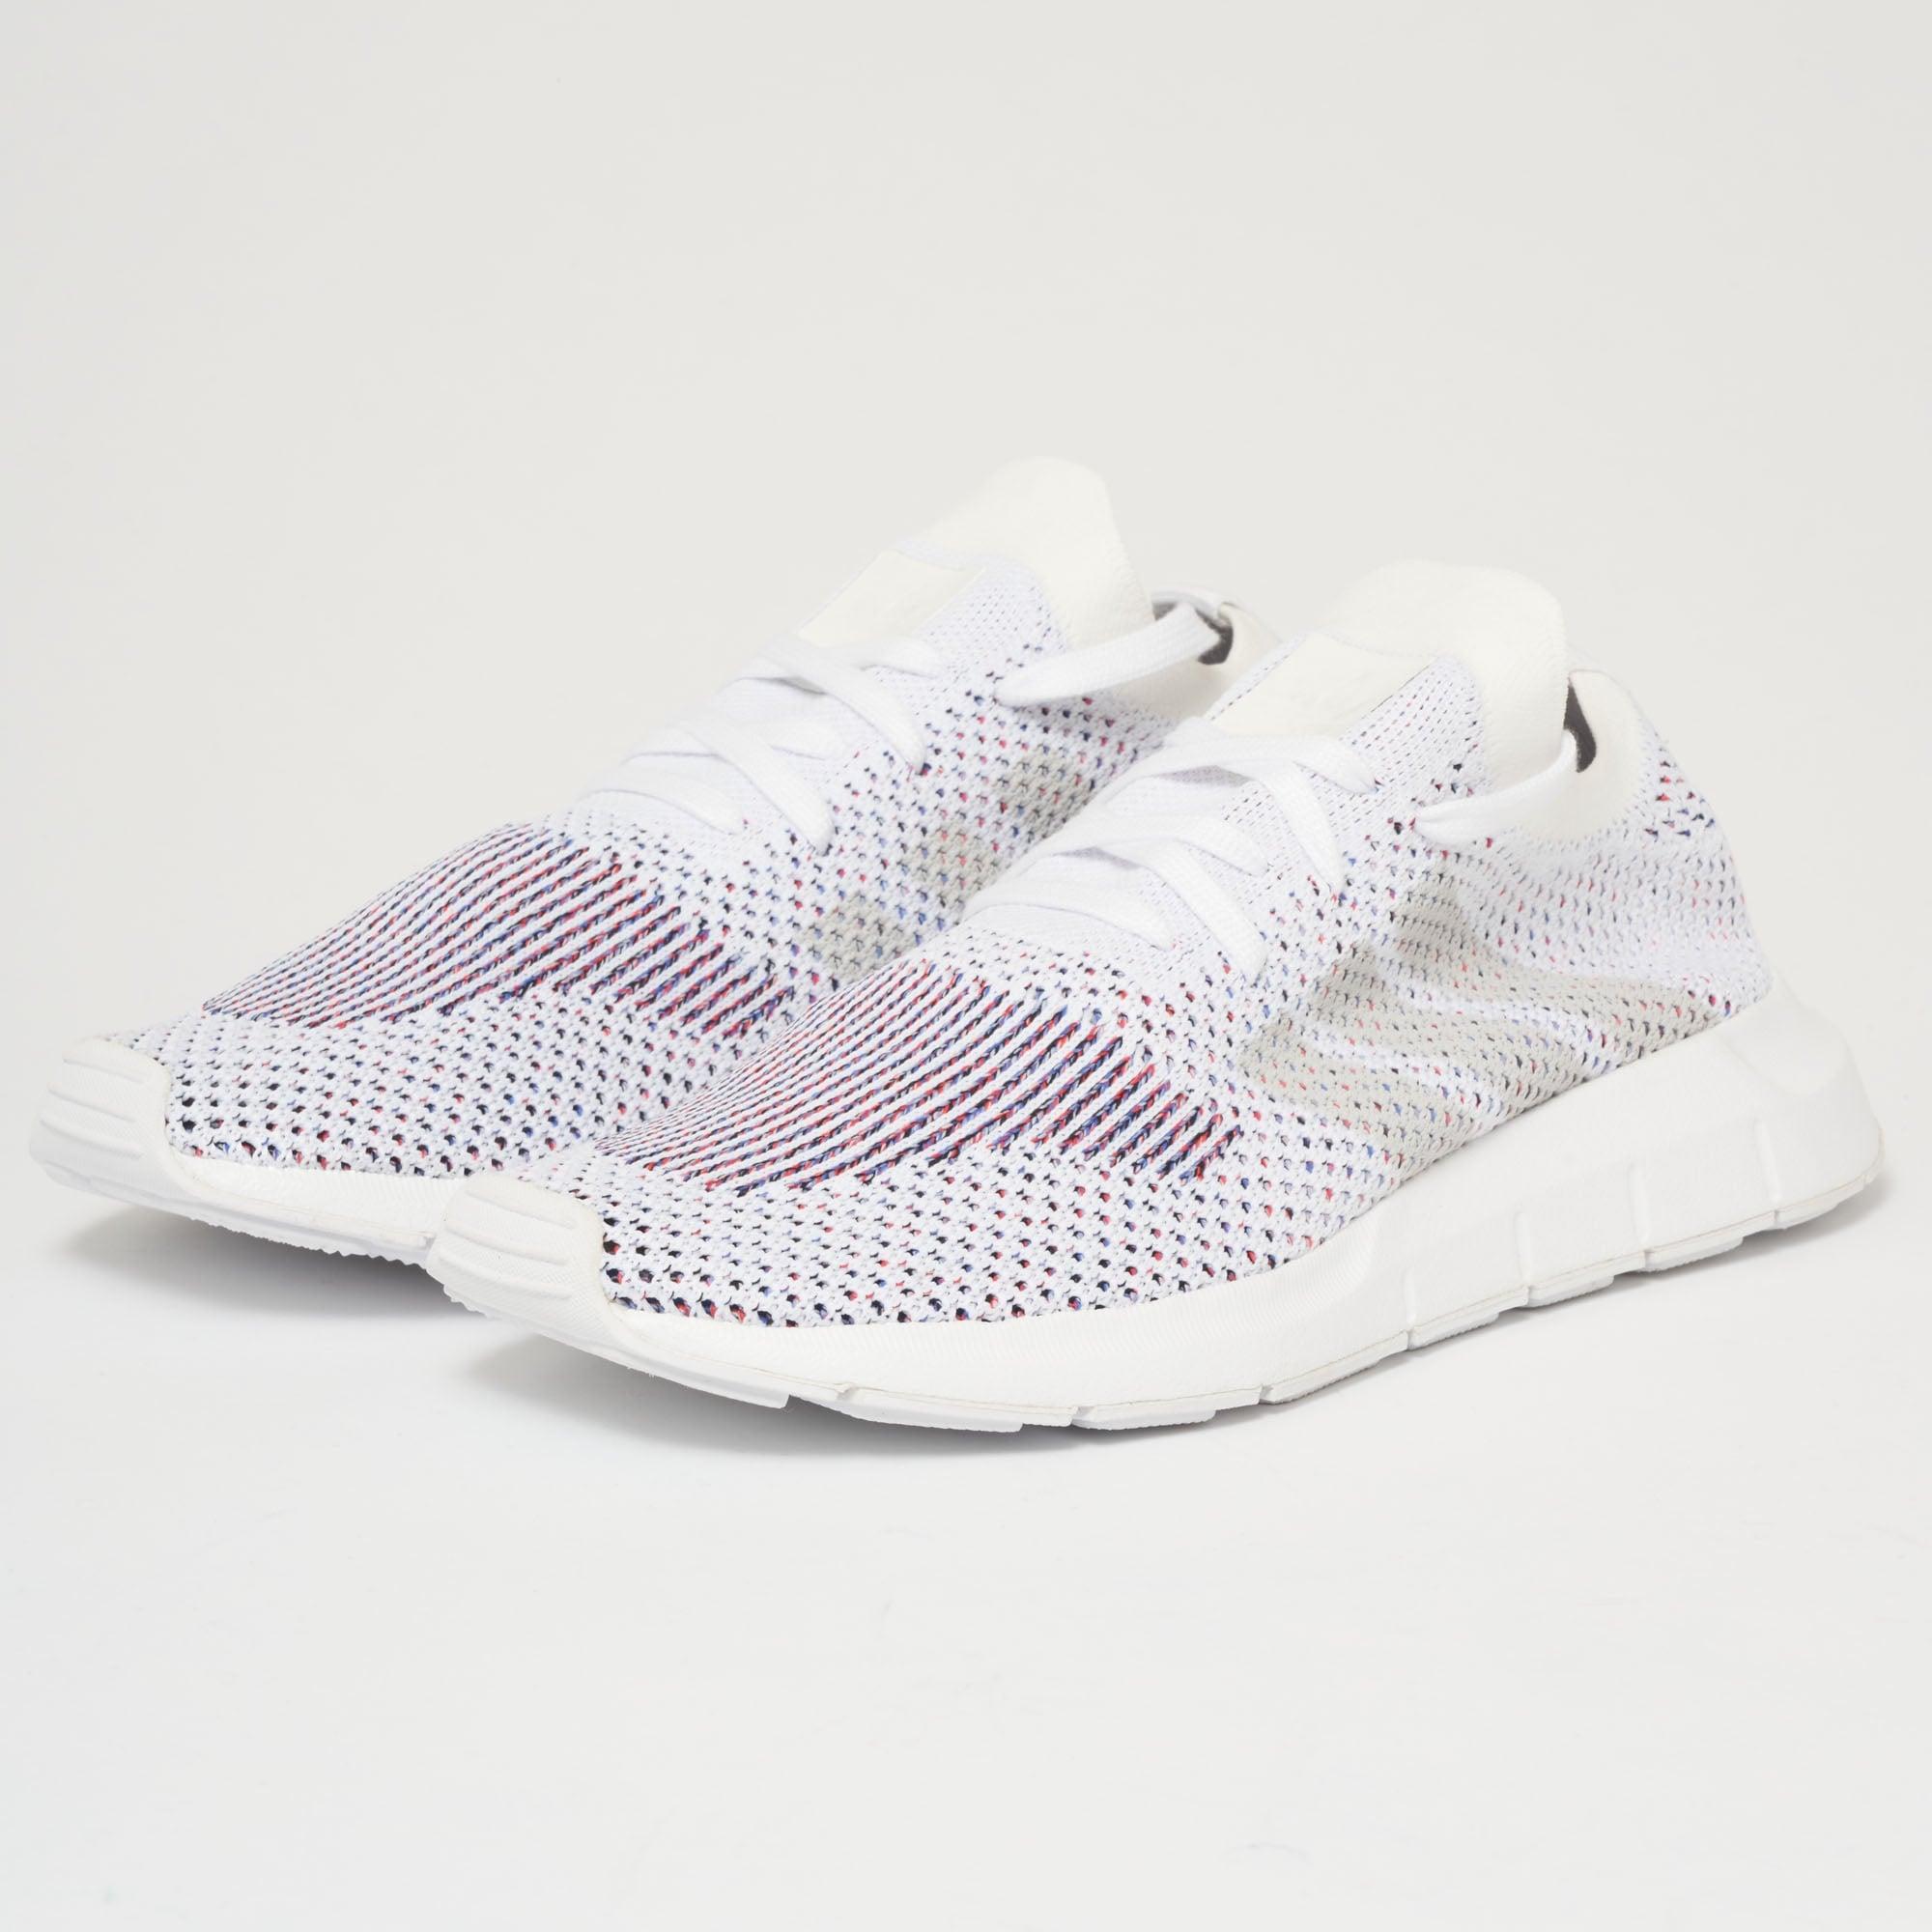 Adidas Originals Swift Run PK | FTW